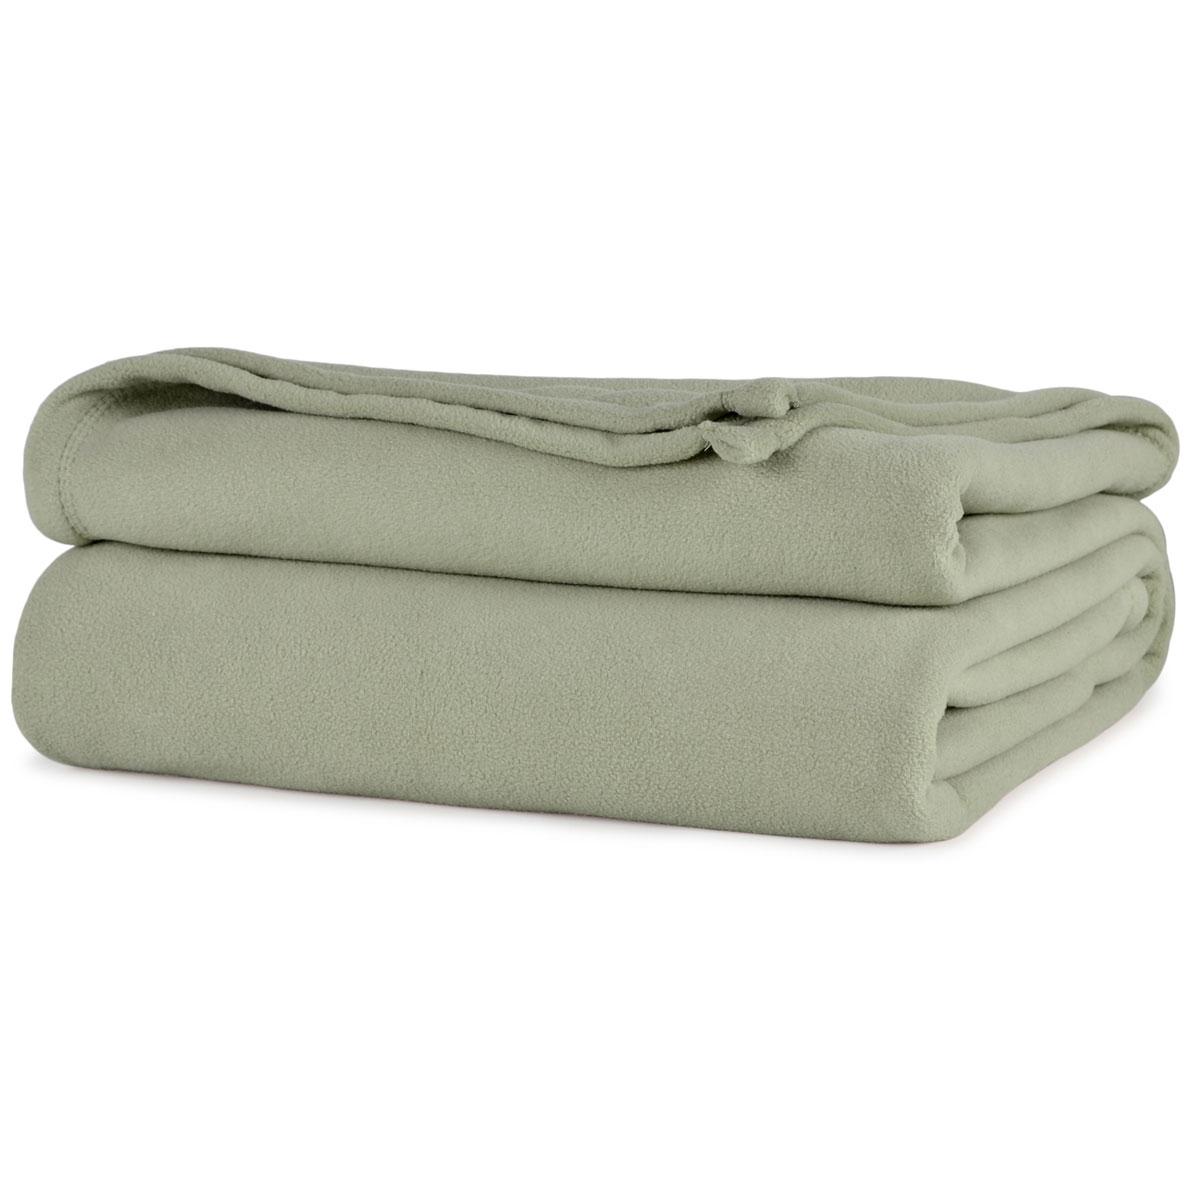 Berkshire Microloft Blanket 240 Gsm Twin 66x90 12 Per Case